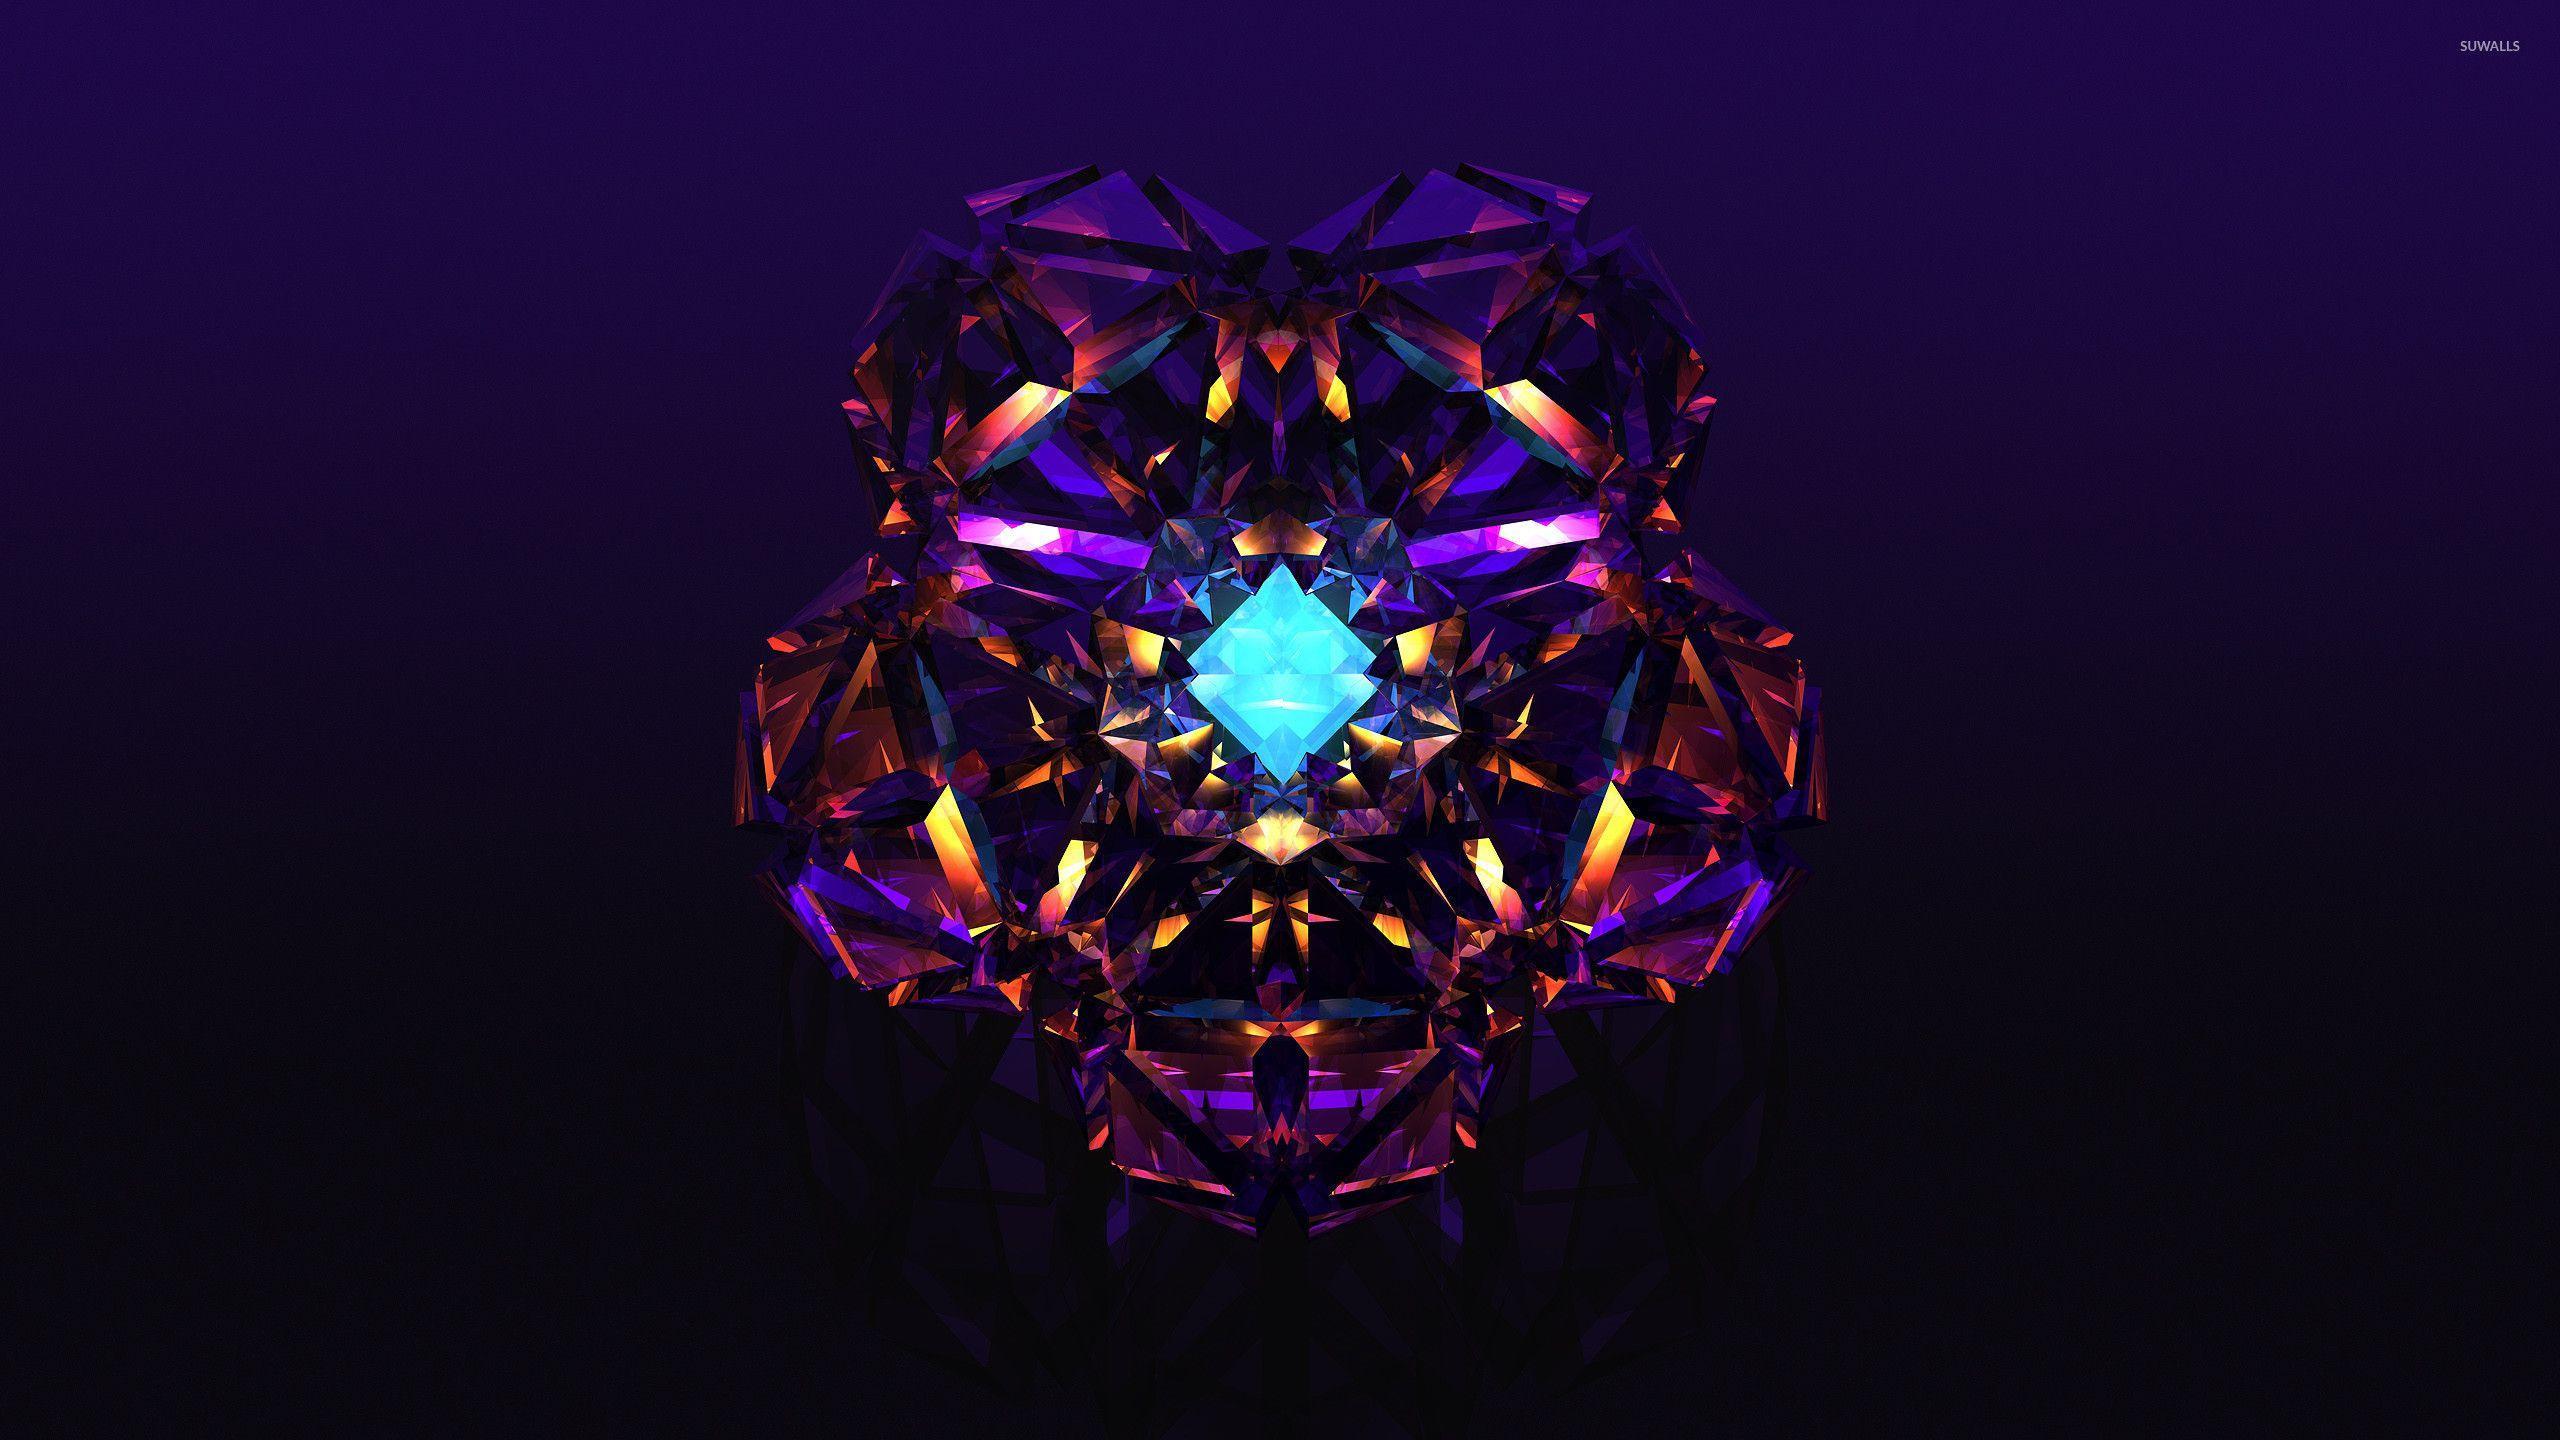 2048x1228 Diamond Wallpaper Hd Of Desktop Full Pics Gipsypixel Com